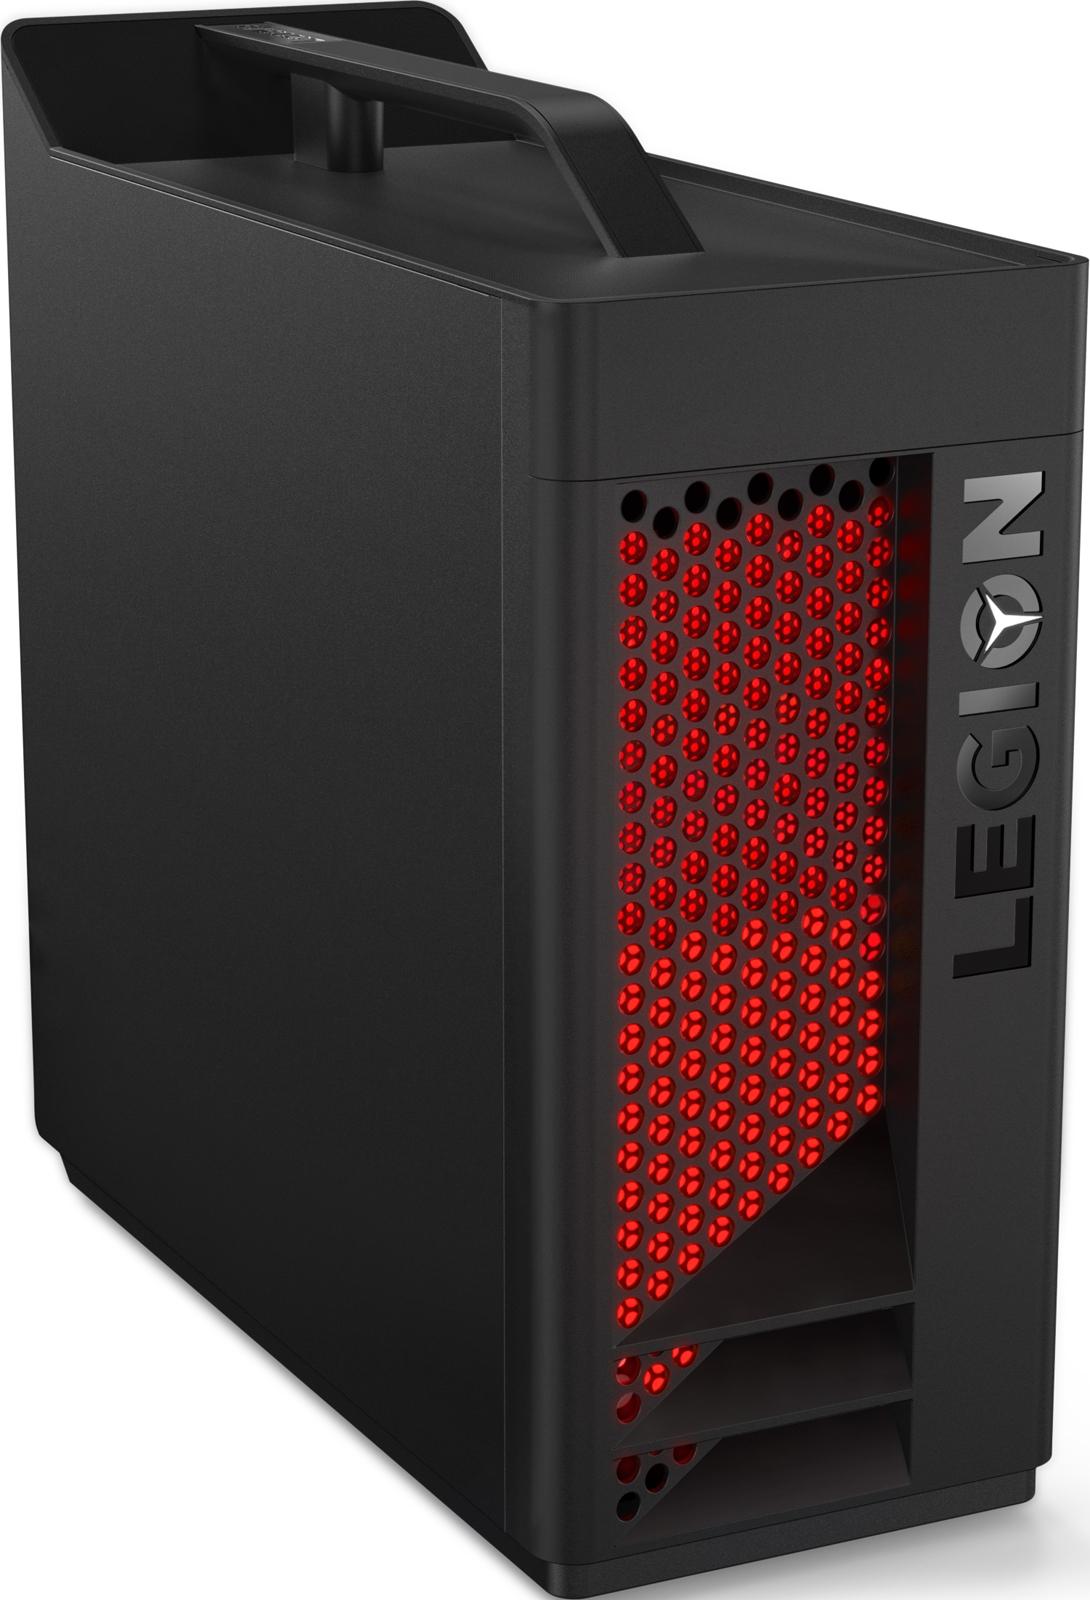 ПК Lenovo Legion T530-28ICB MT i5 8400/8Gb/1Tb 7.2k/SSD256Gb/GTX1060 6Gb/DVDRW/DOS/черный пэвм personal 0686439 i5 8500 b360 16gb 250gb 1tb gtx1060 6gb dvd±rw win10 pro office2019h